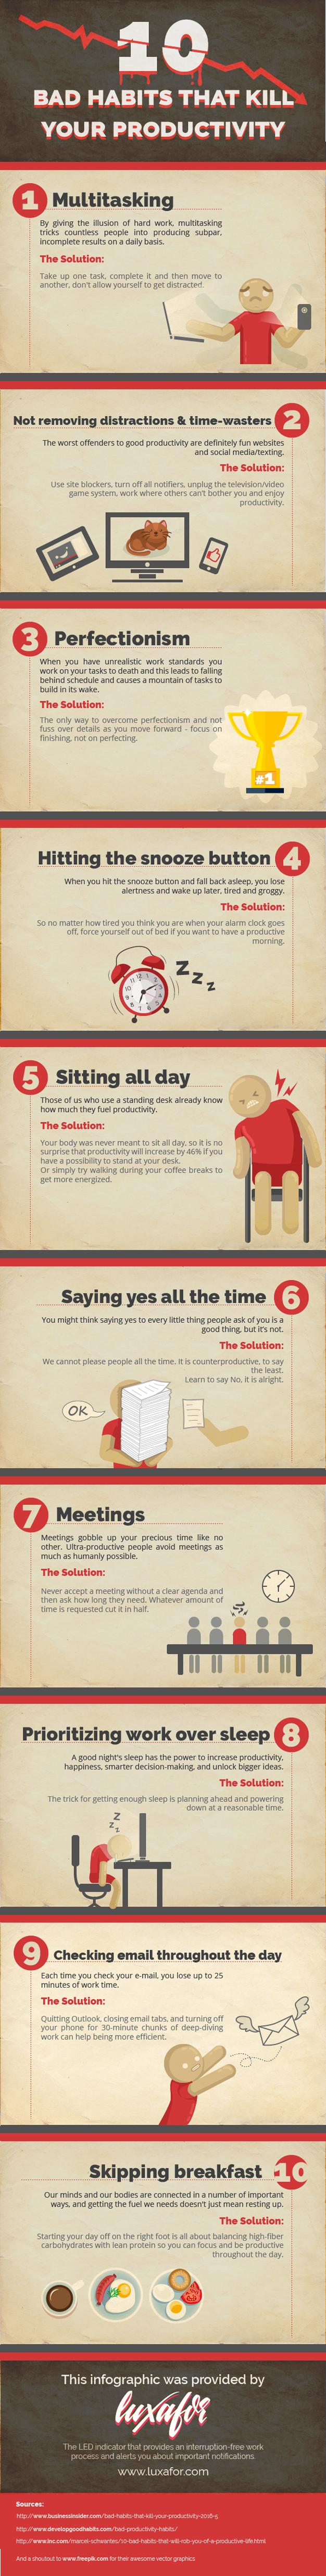 Infographic-productivity-habits